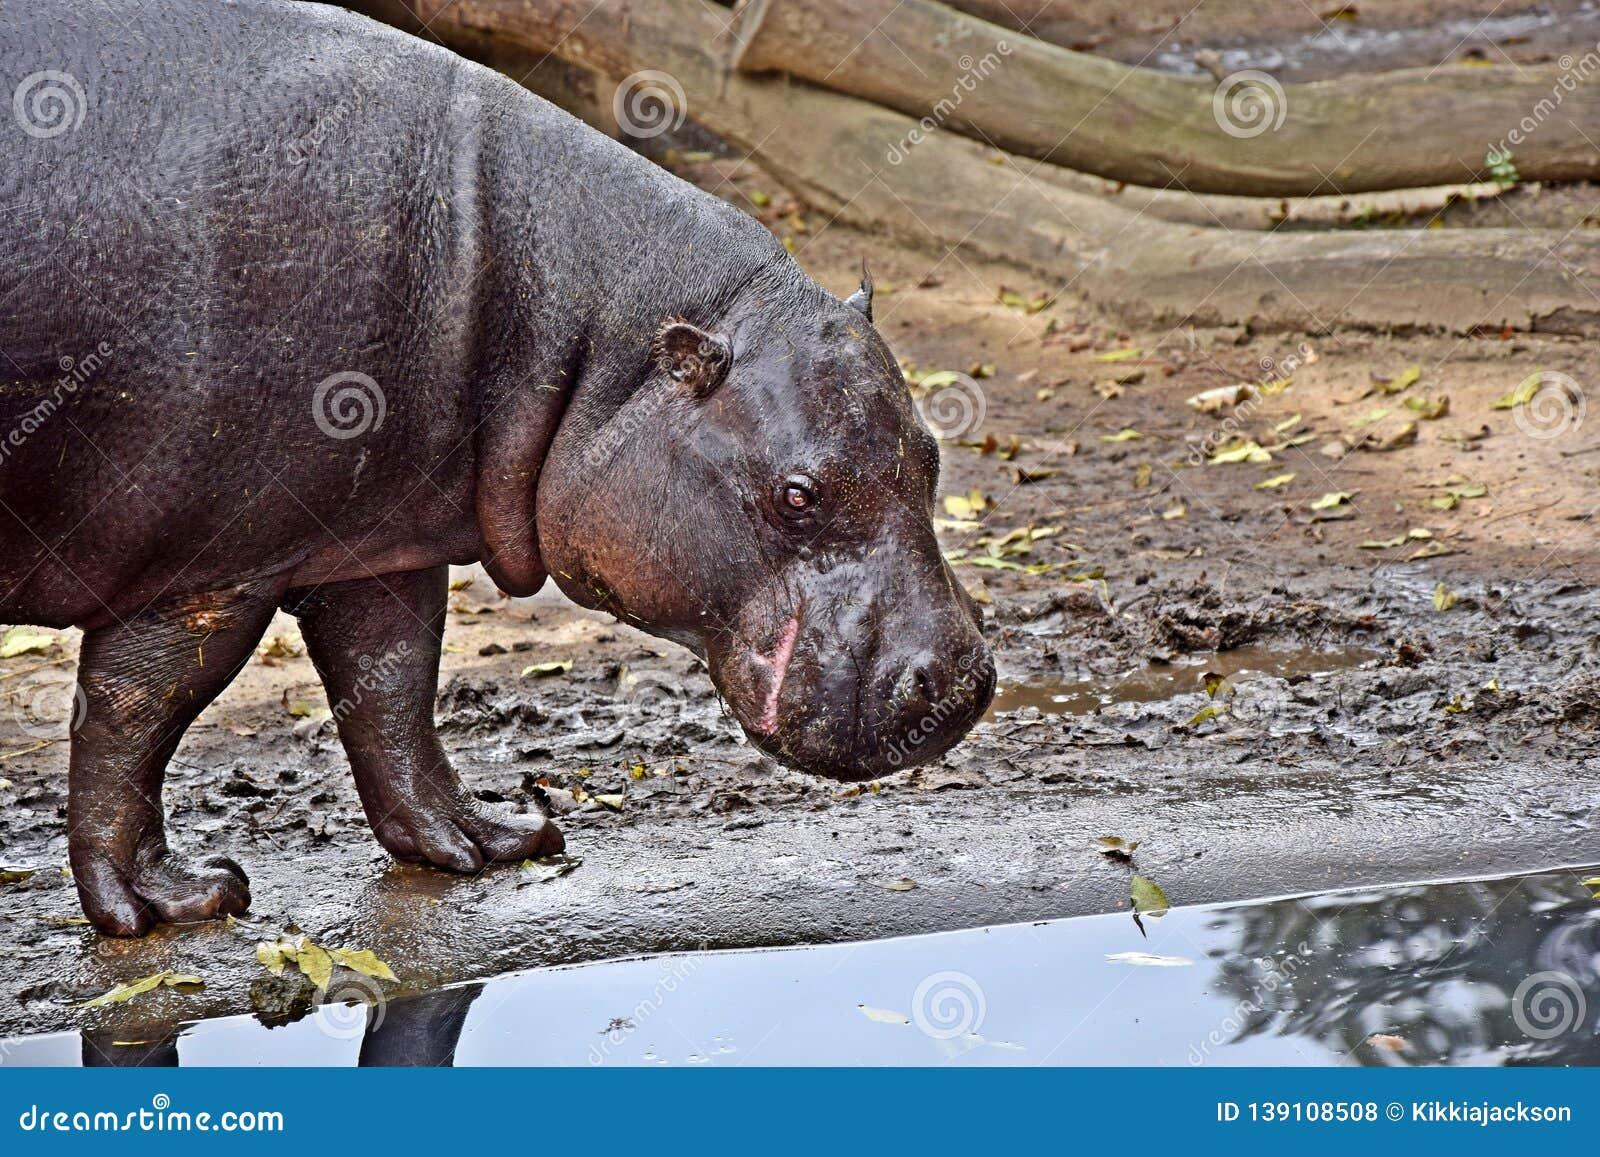 Choeropsis Liberiensis Small Hippopotamus Stock Photo